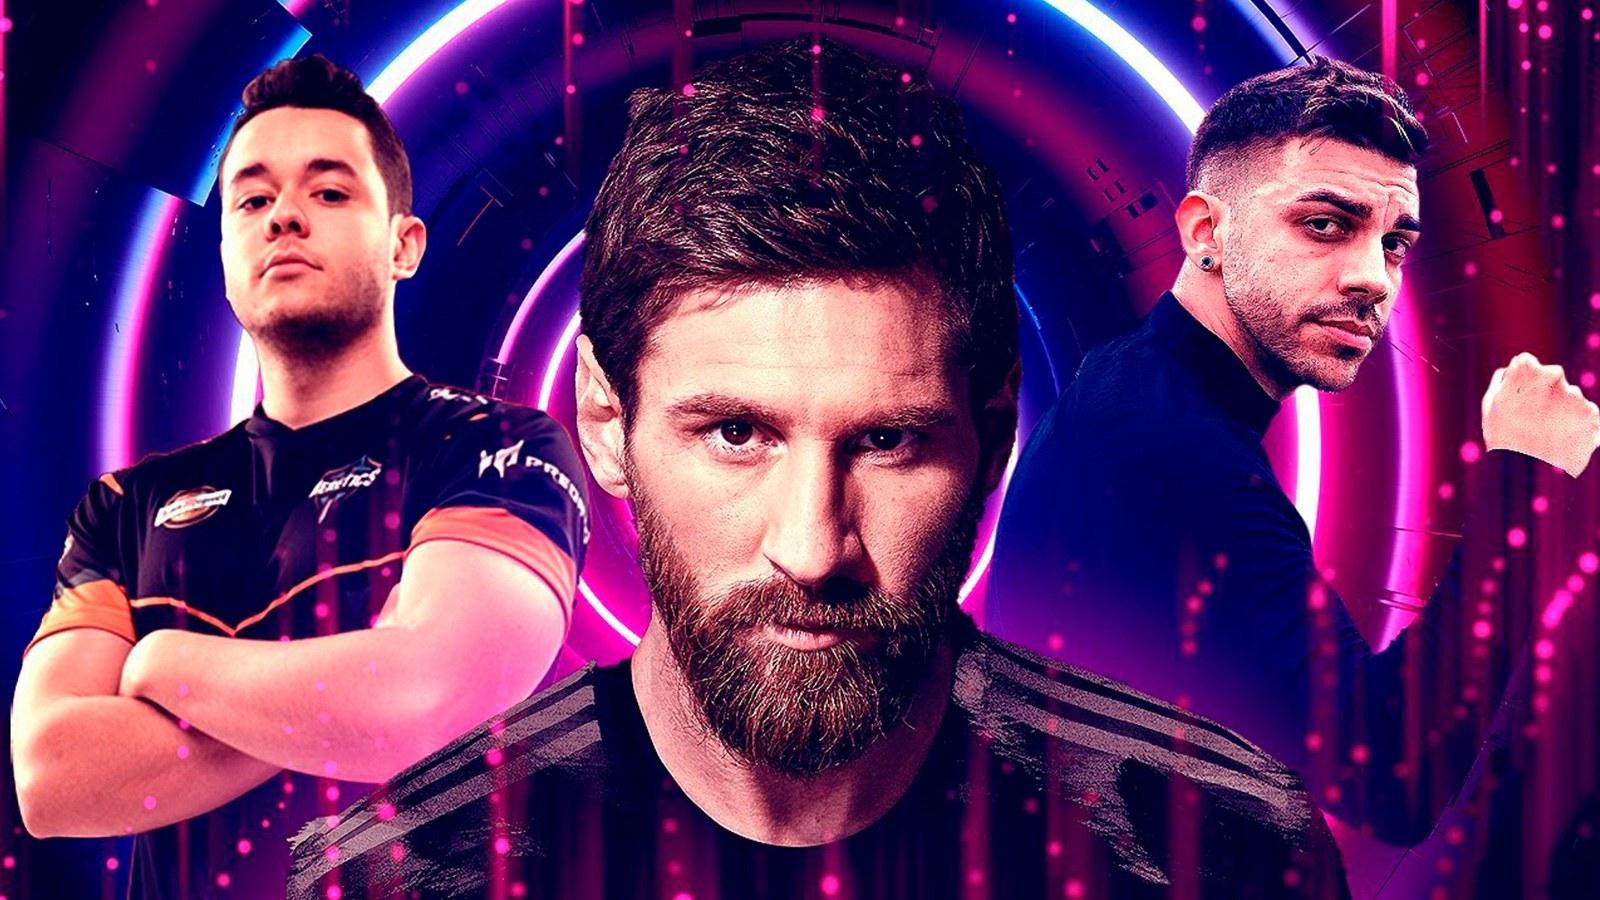 Triangular Leo Messi